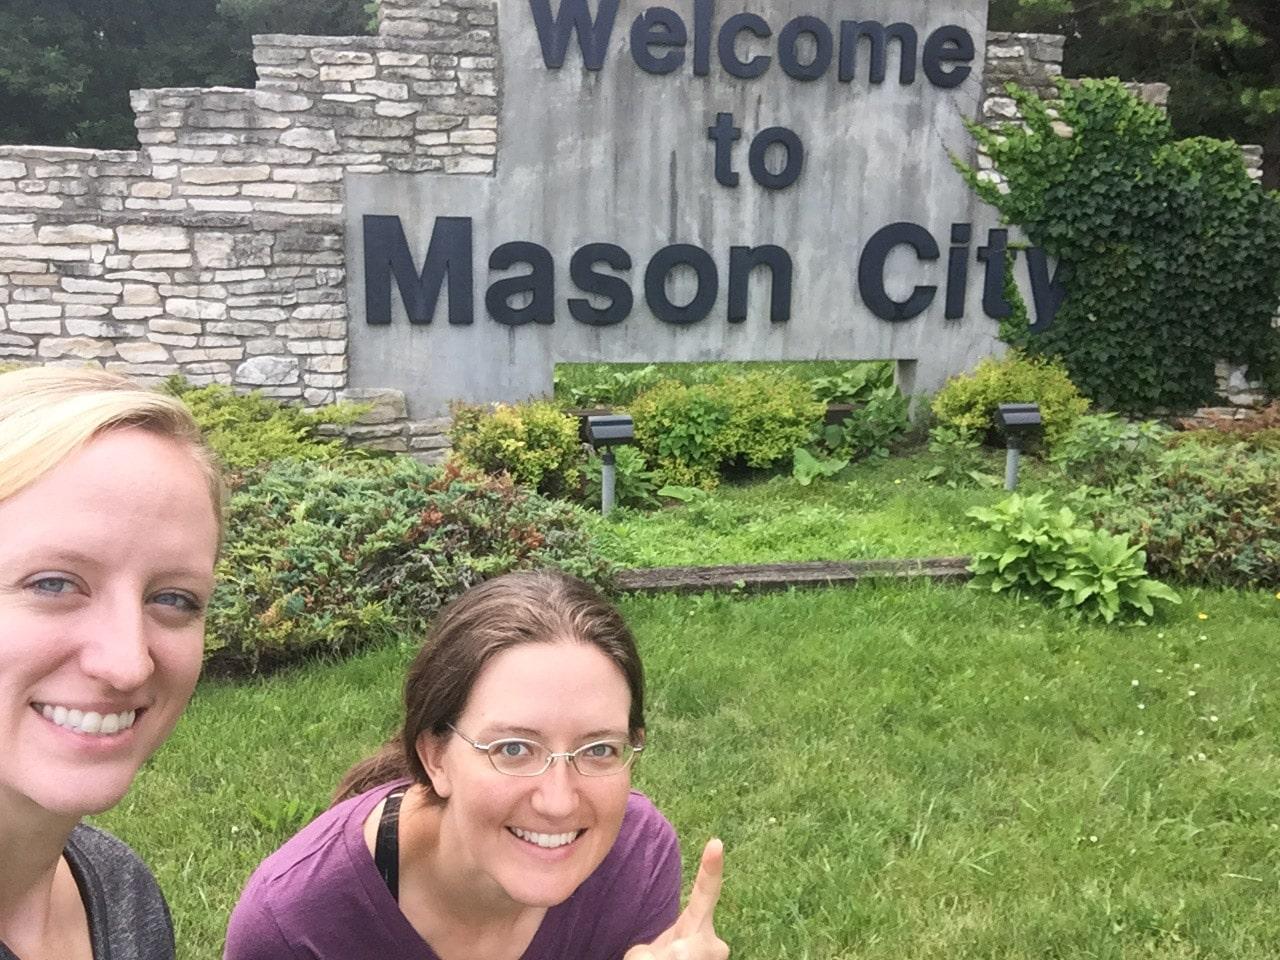 Mason City Iowa